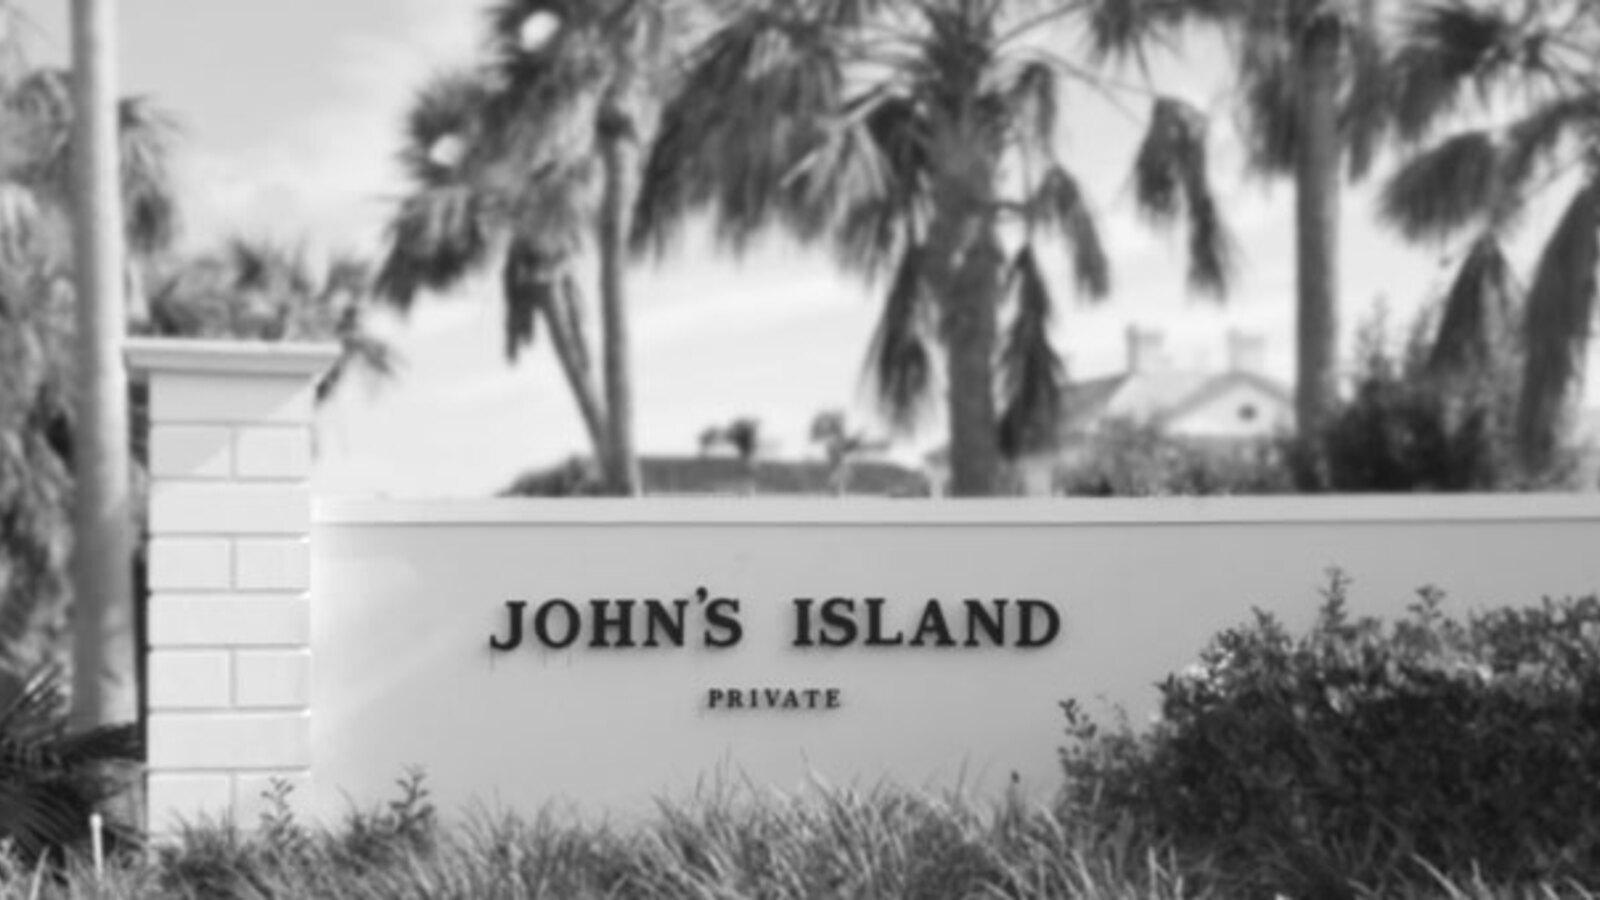 John's Island Entryway